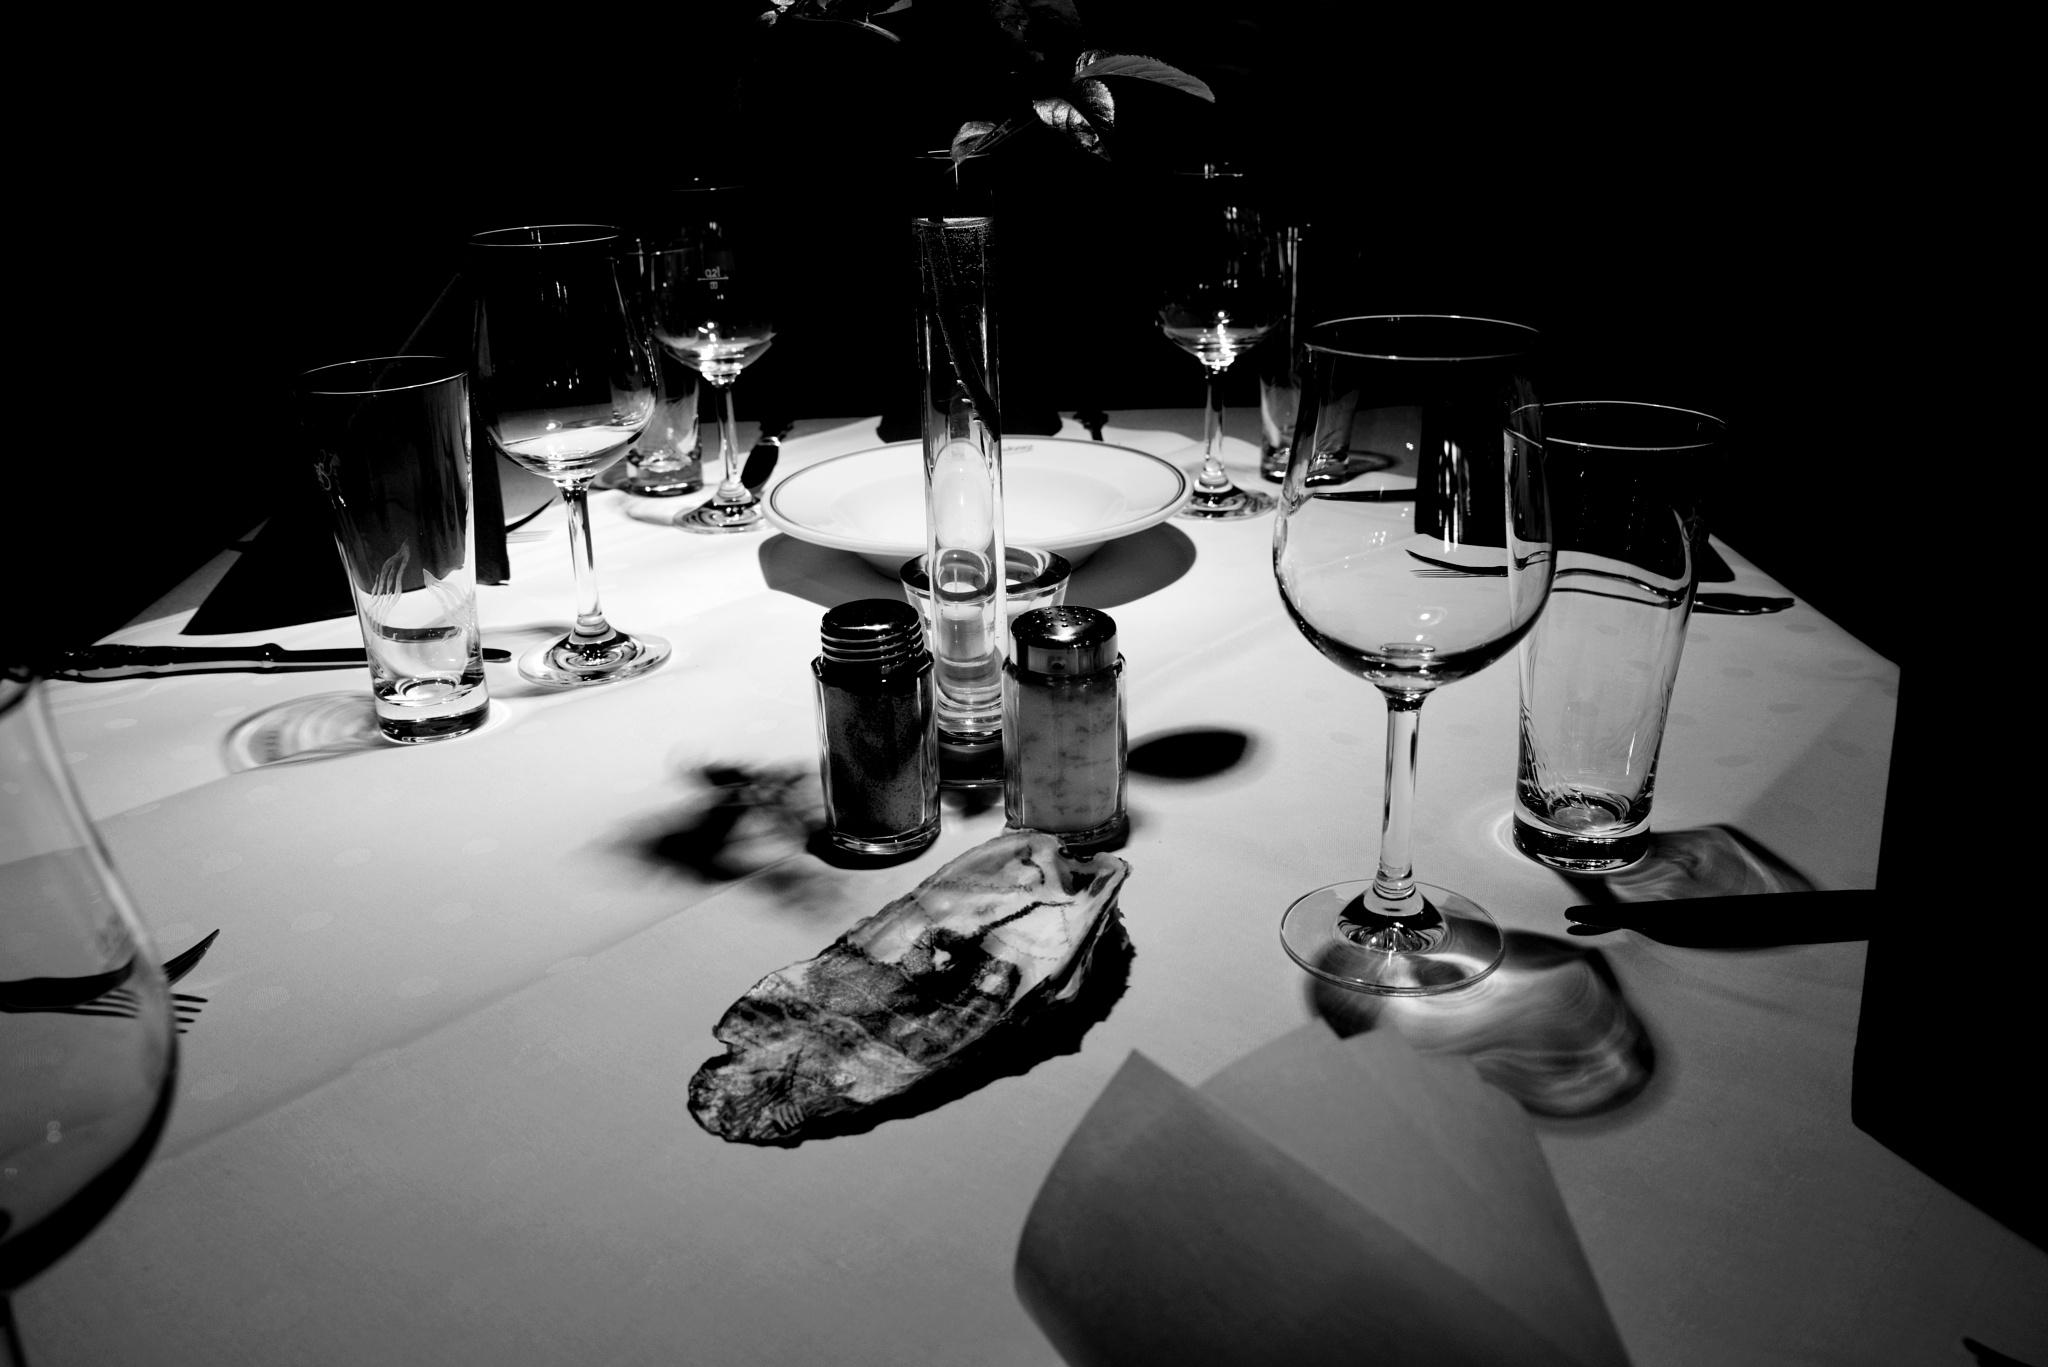 In the restaurant by RIwanowski